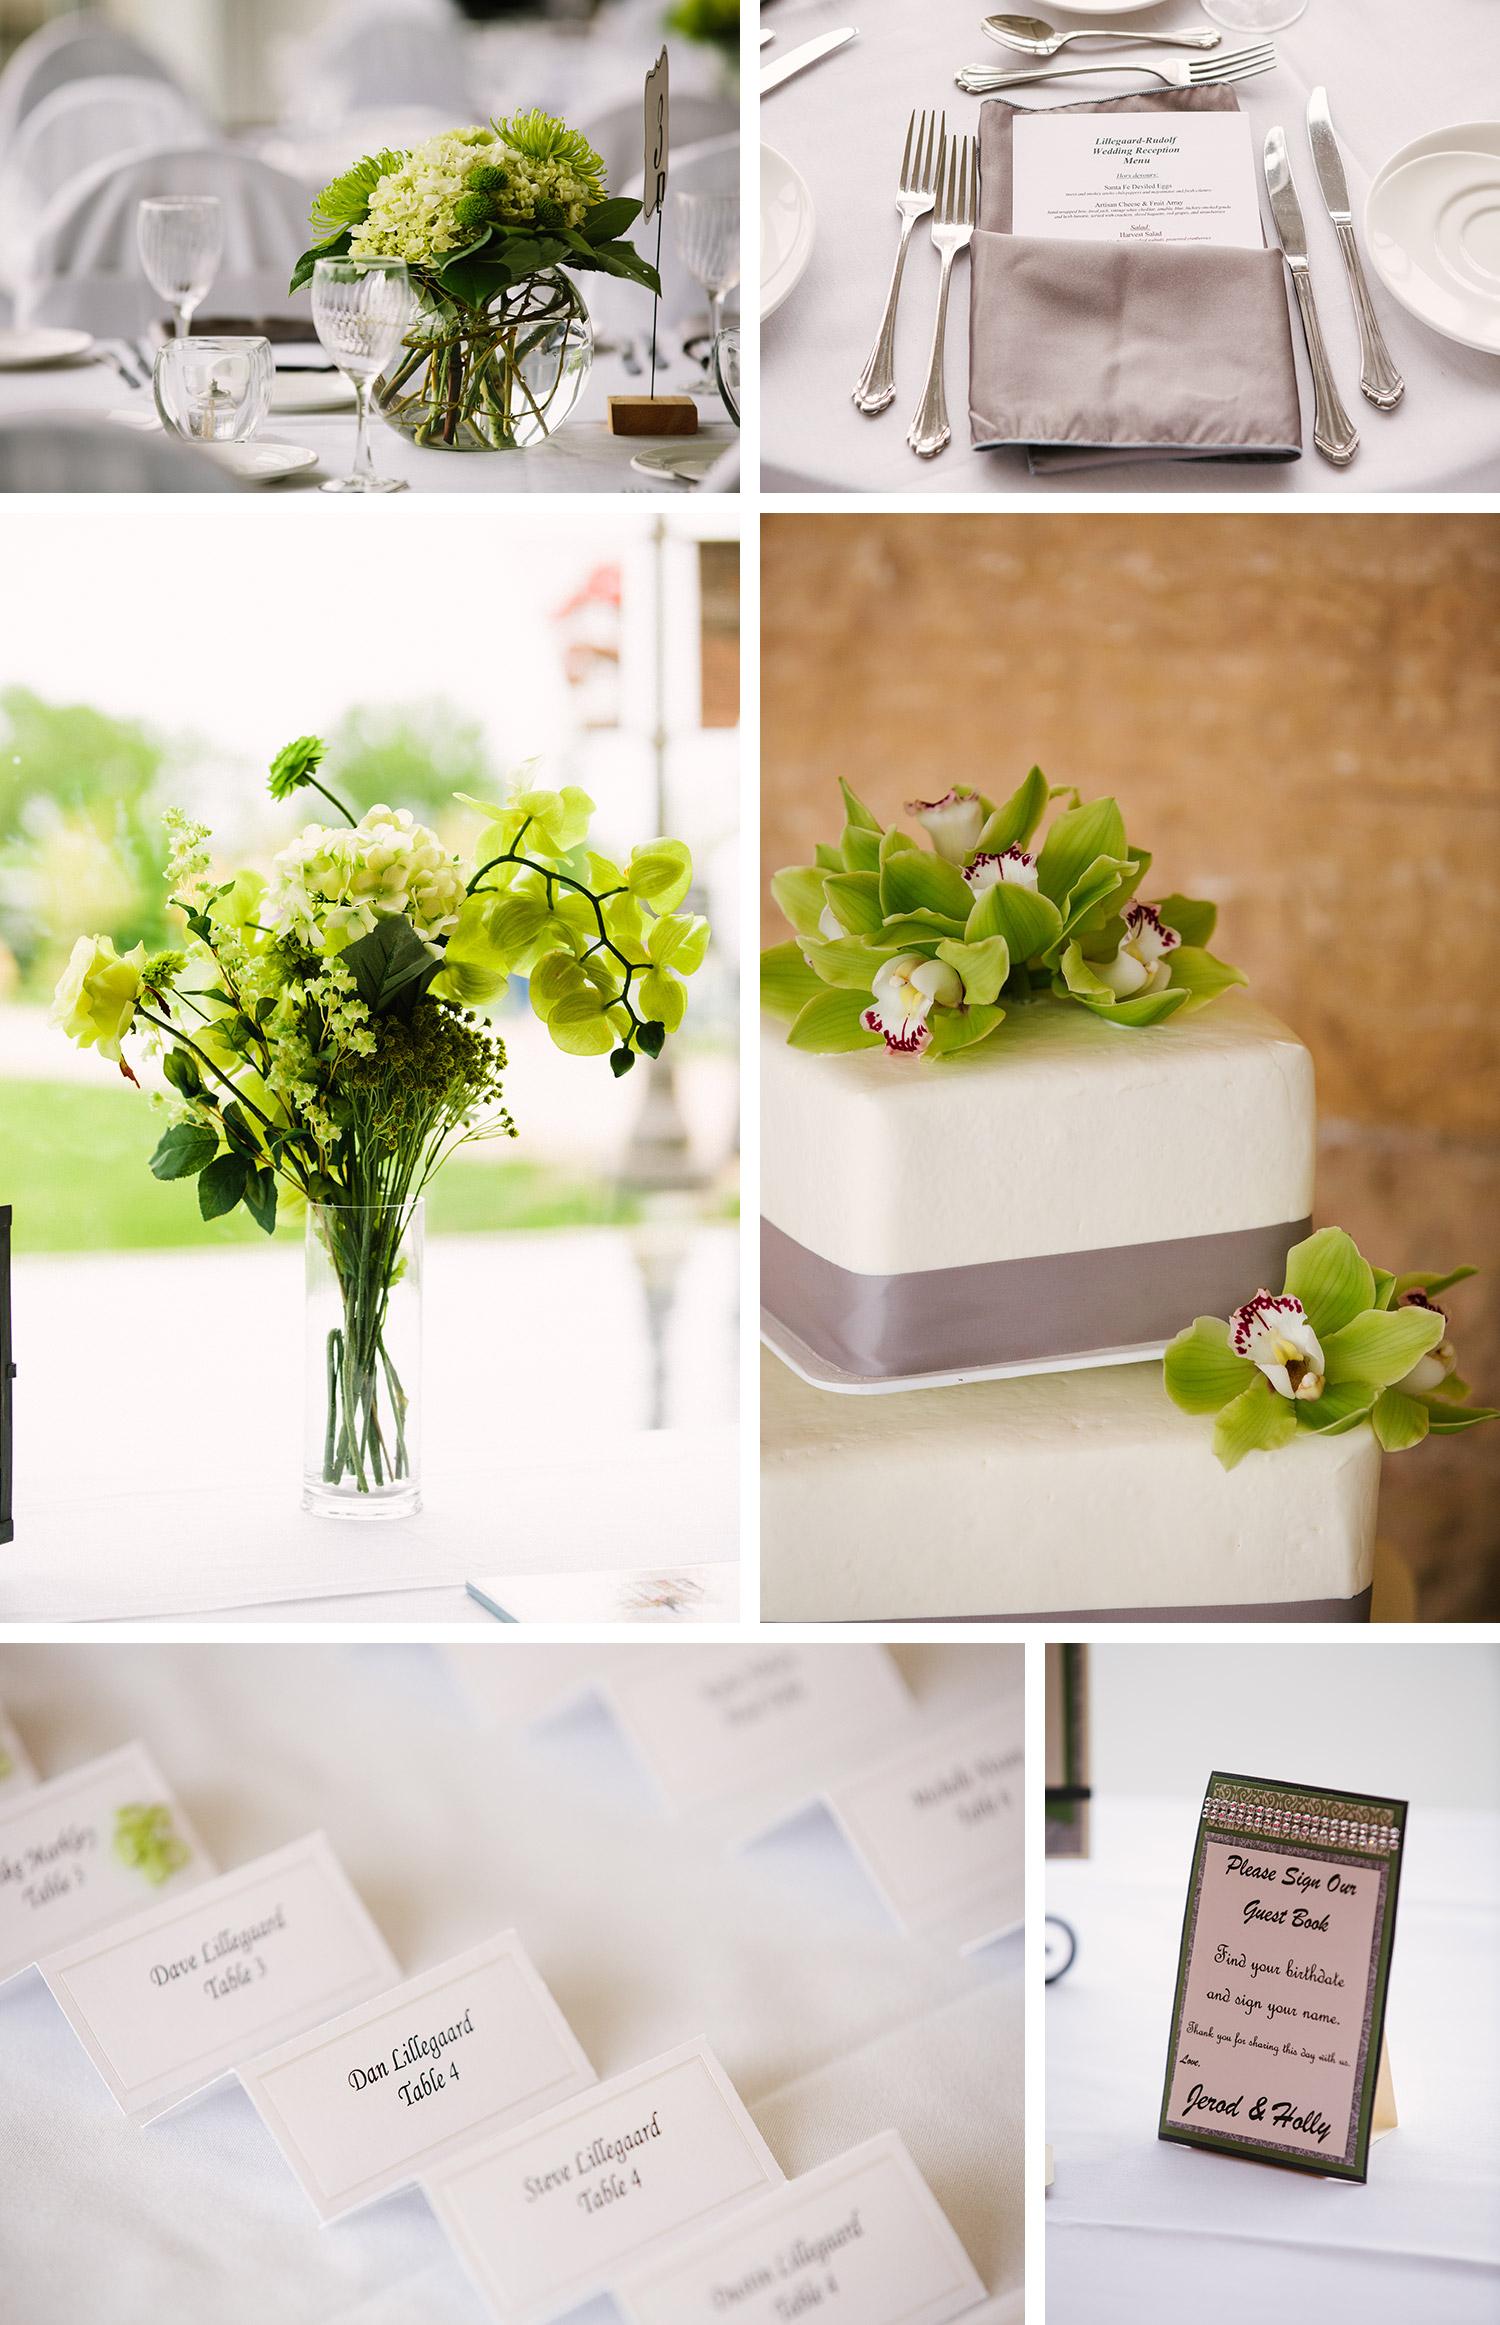 22_Saint_Paul_Hotel_Landmark_Center_wedding.jpg